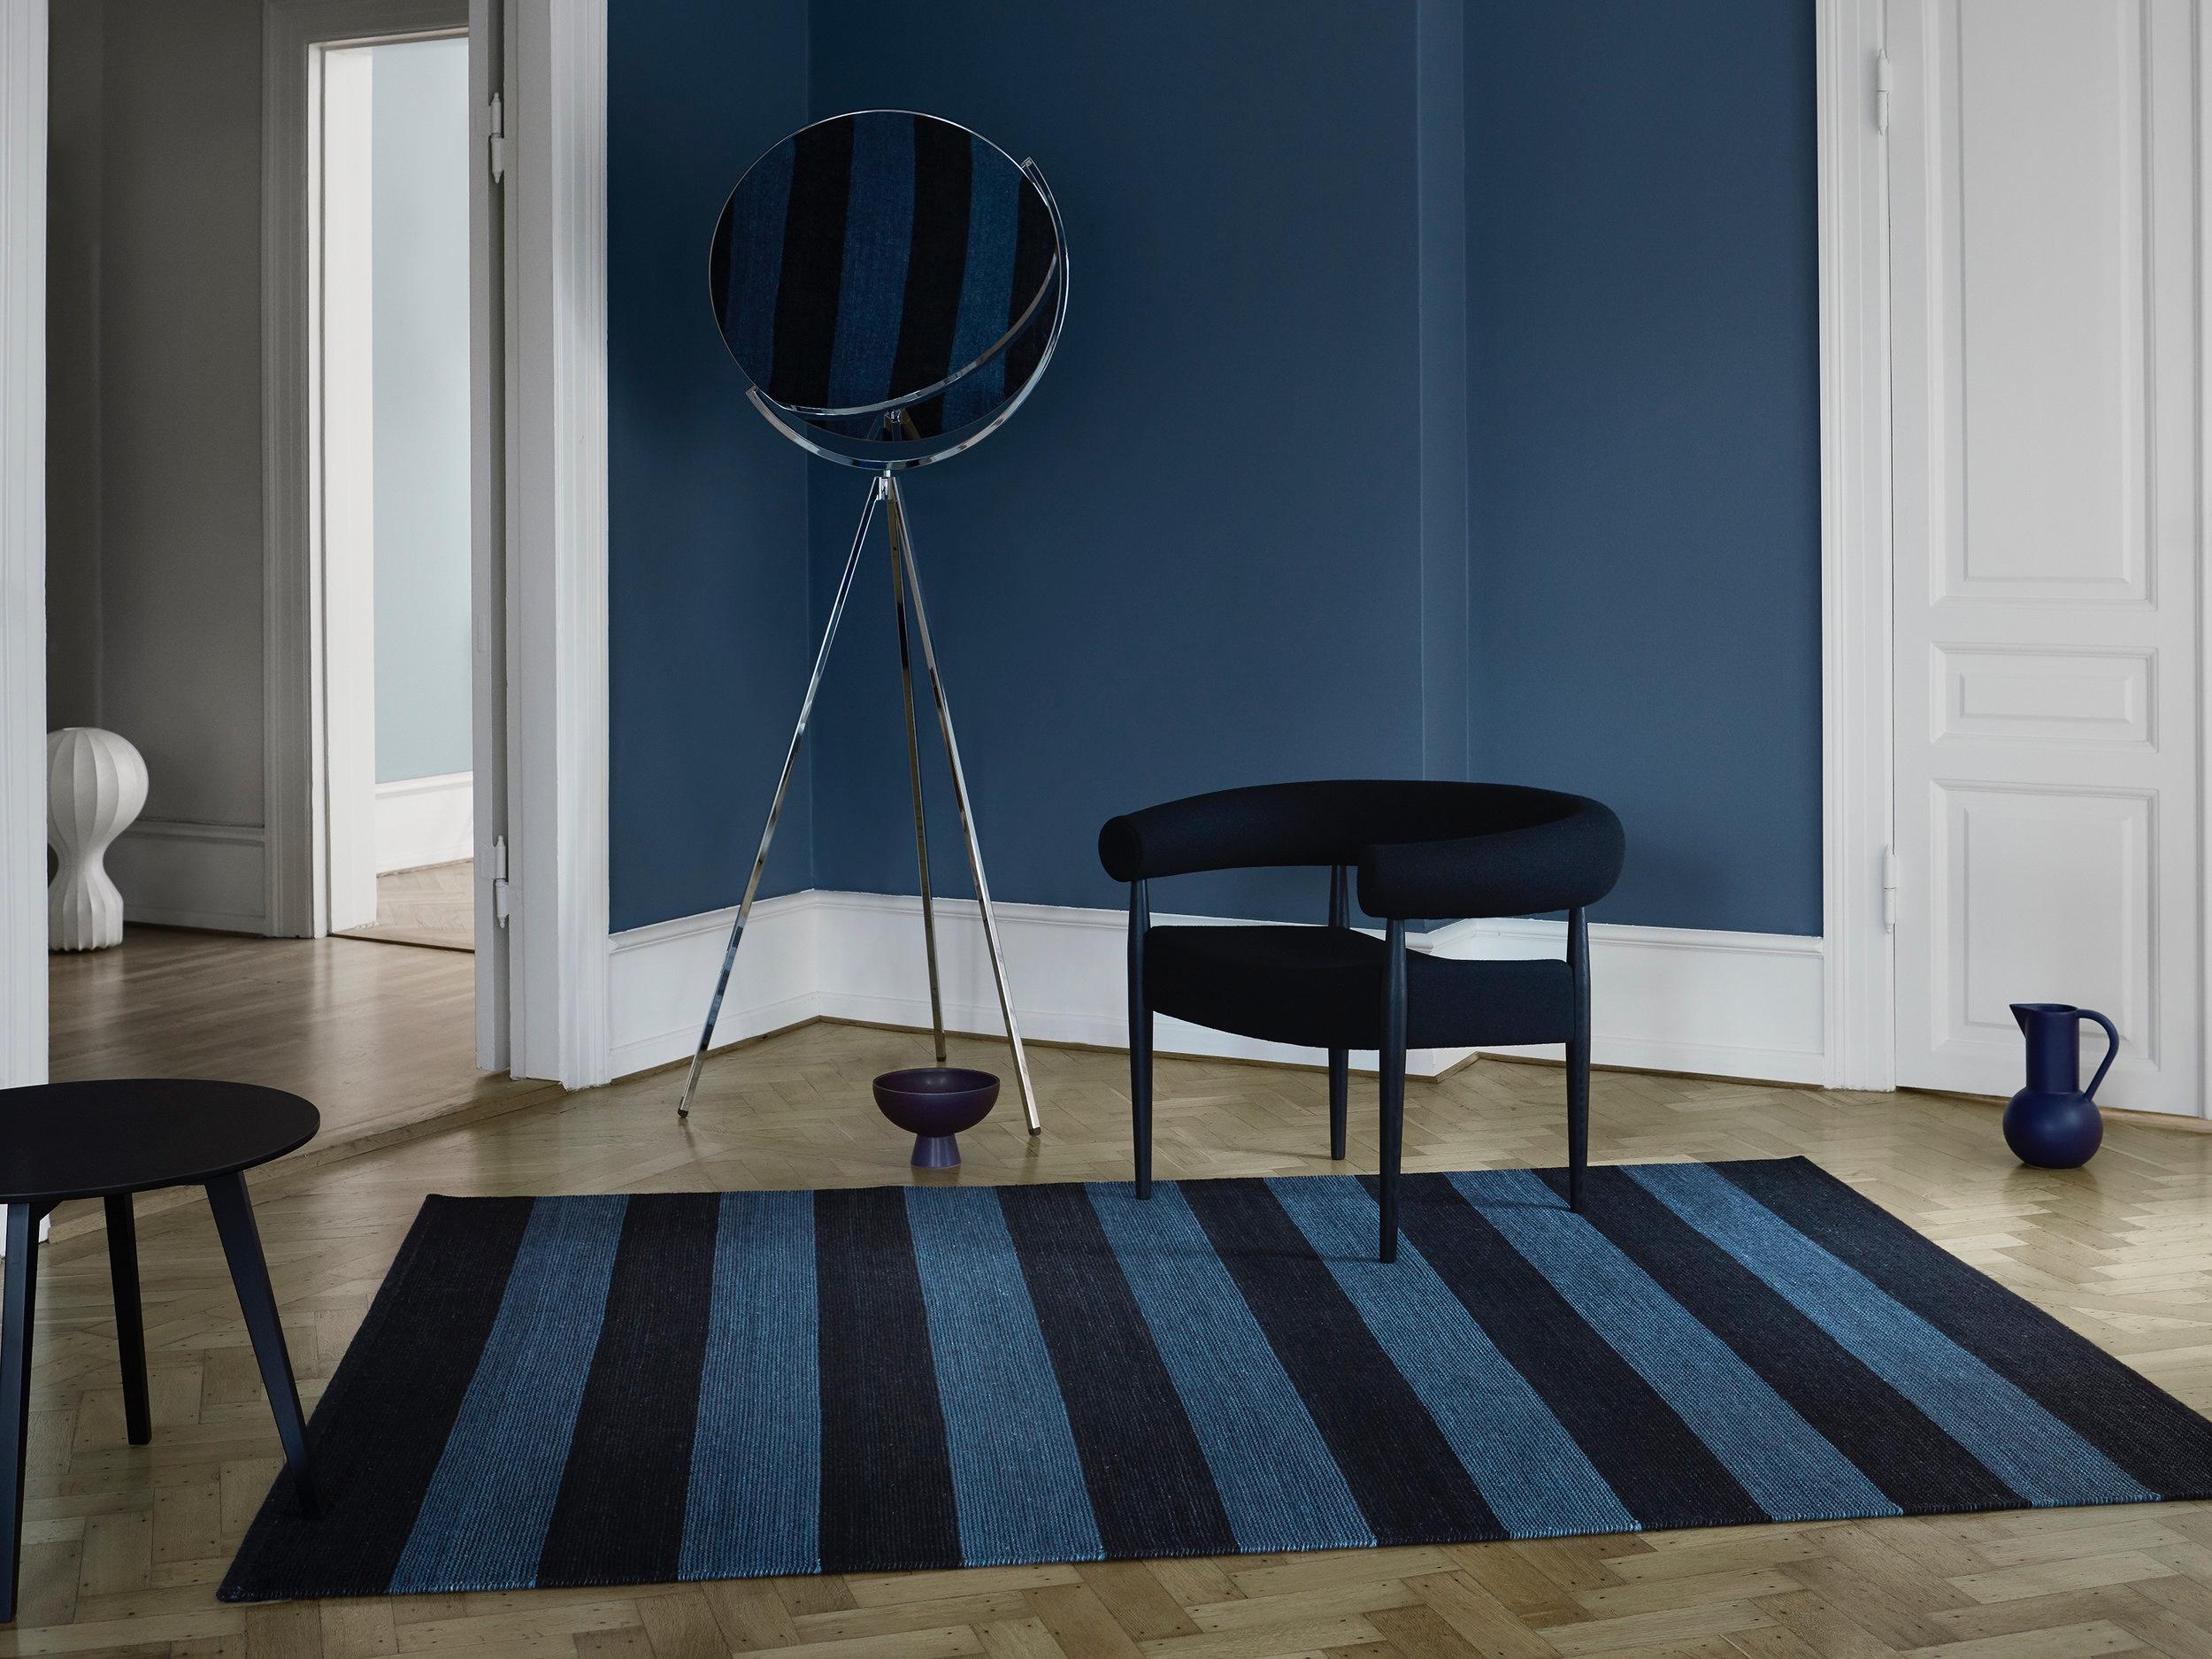 Fabula_Iris_Rug_Black_Blue_Wool_1517_A_Medium.jpg